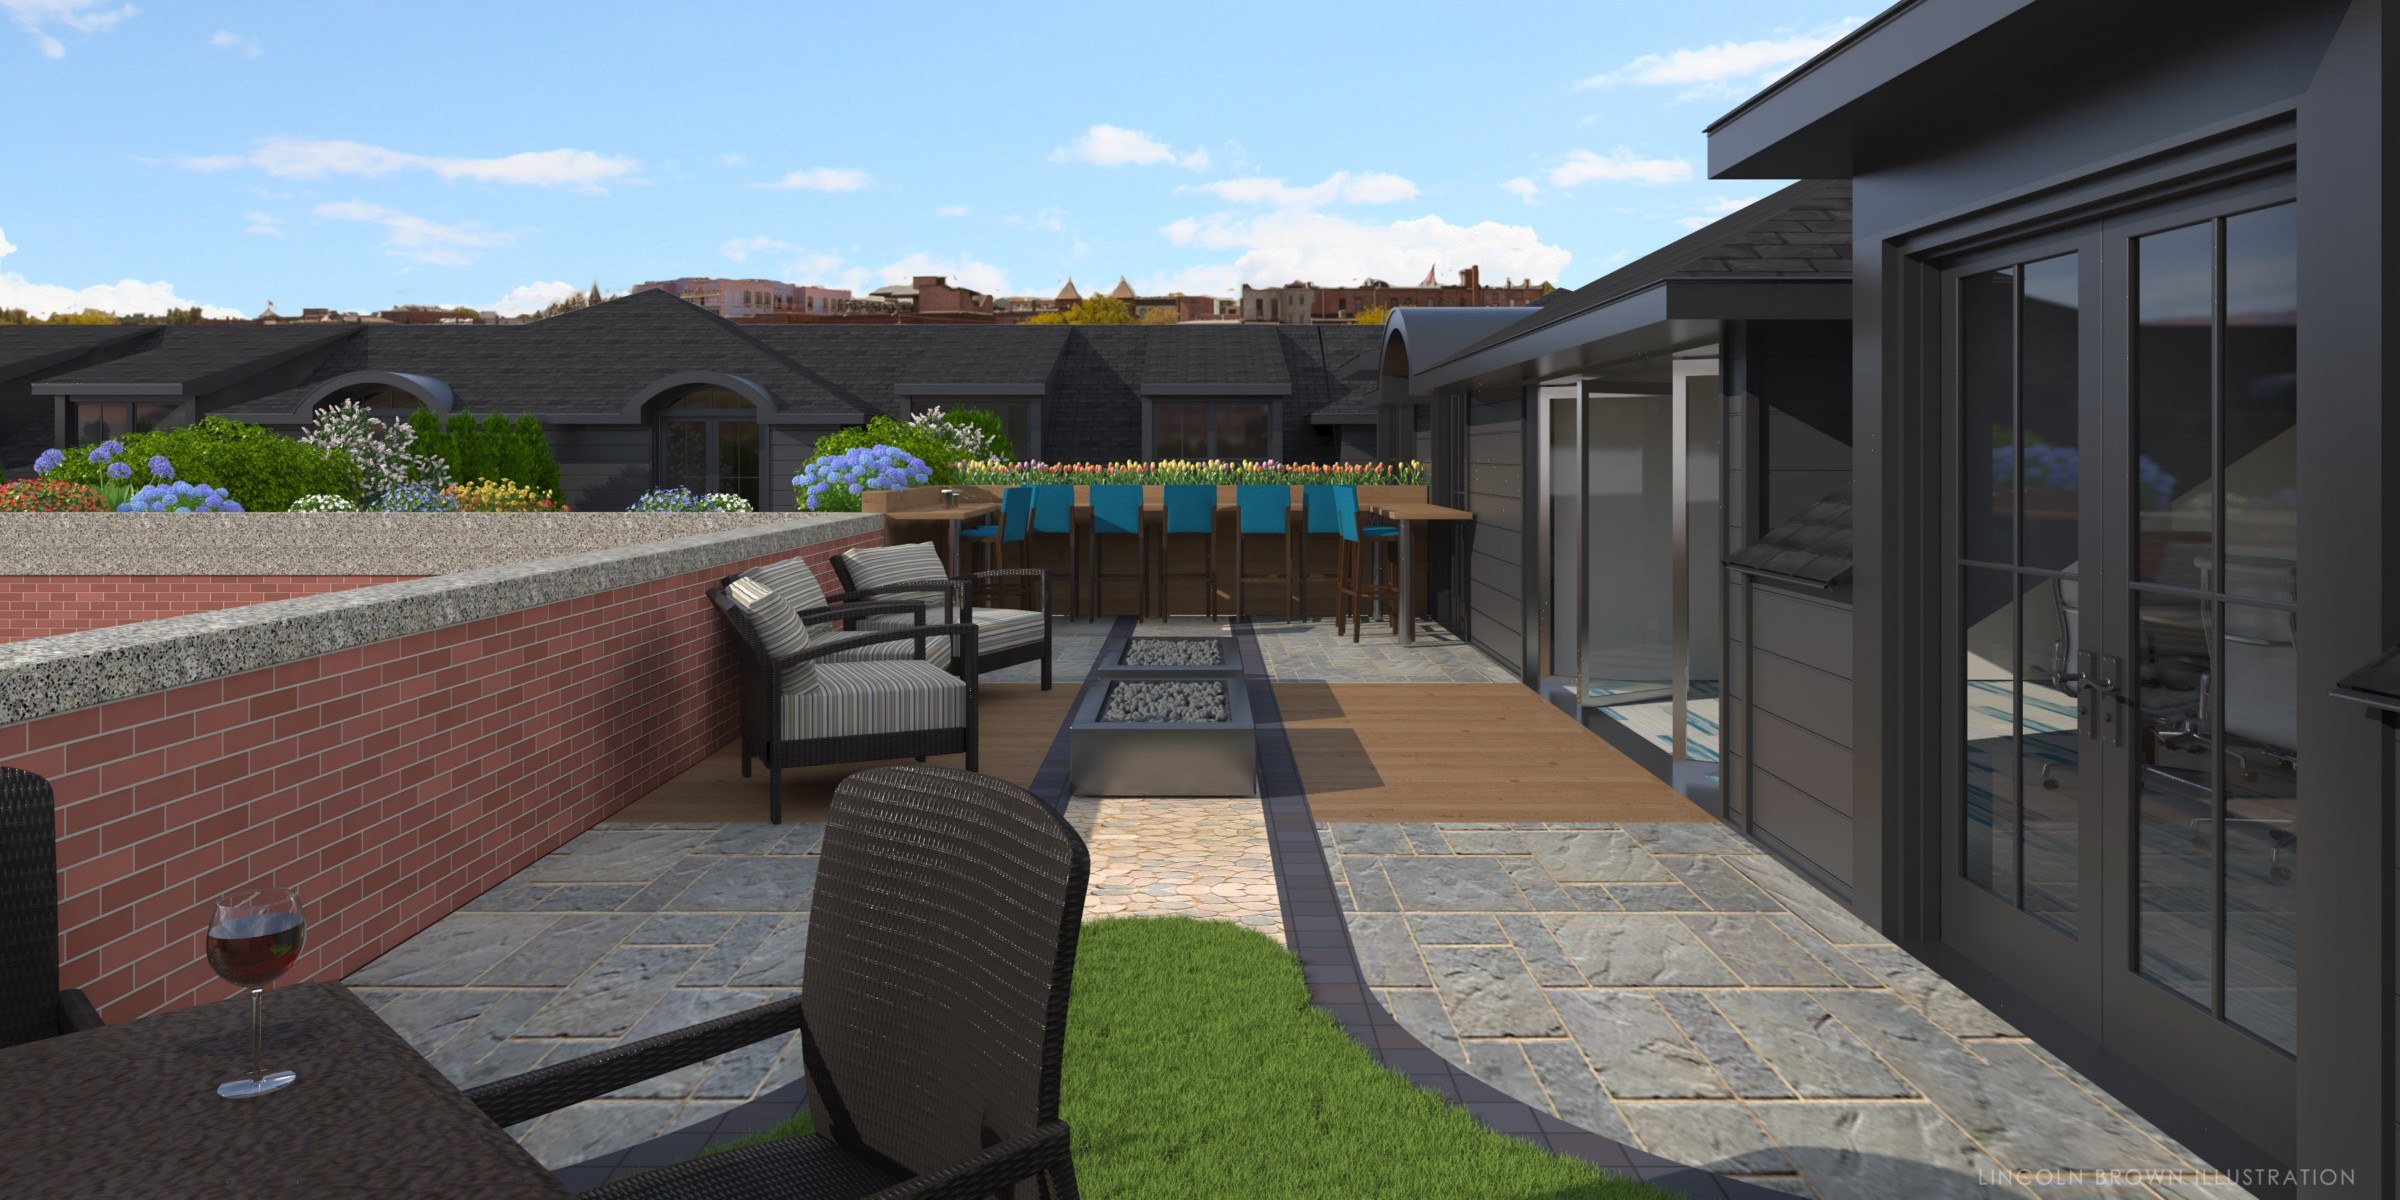 2013-09 Pavilion Grand - Roof Deck06.jpg